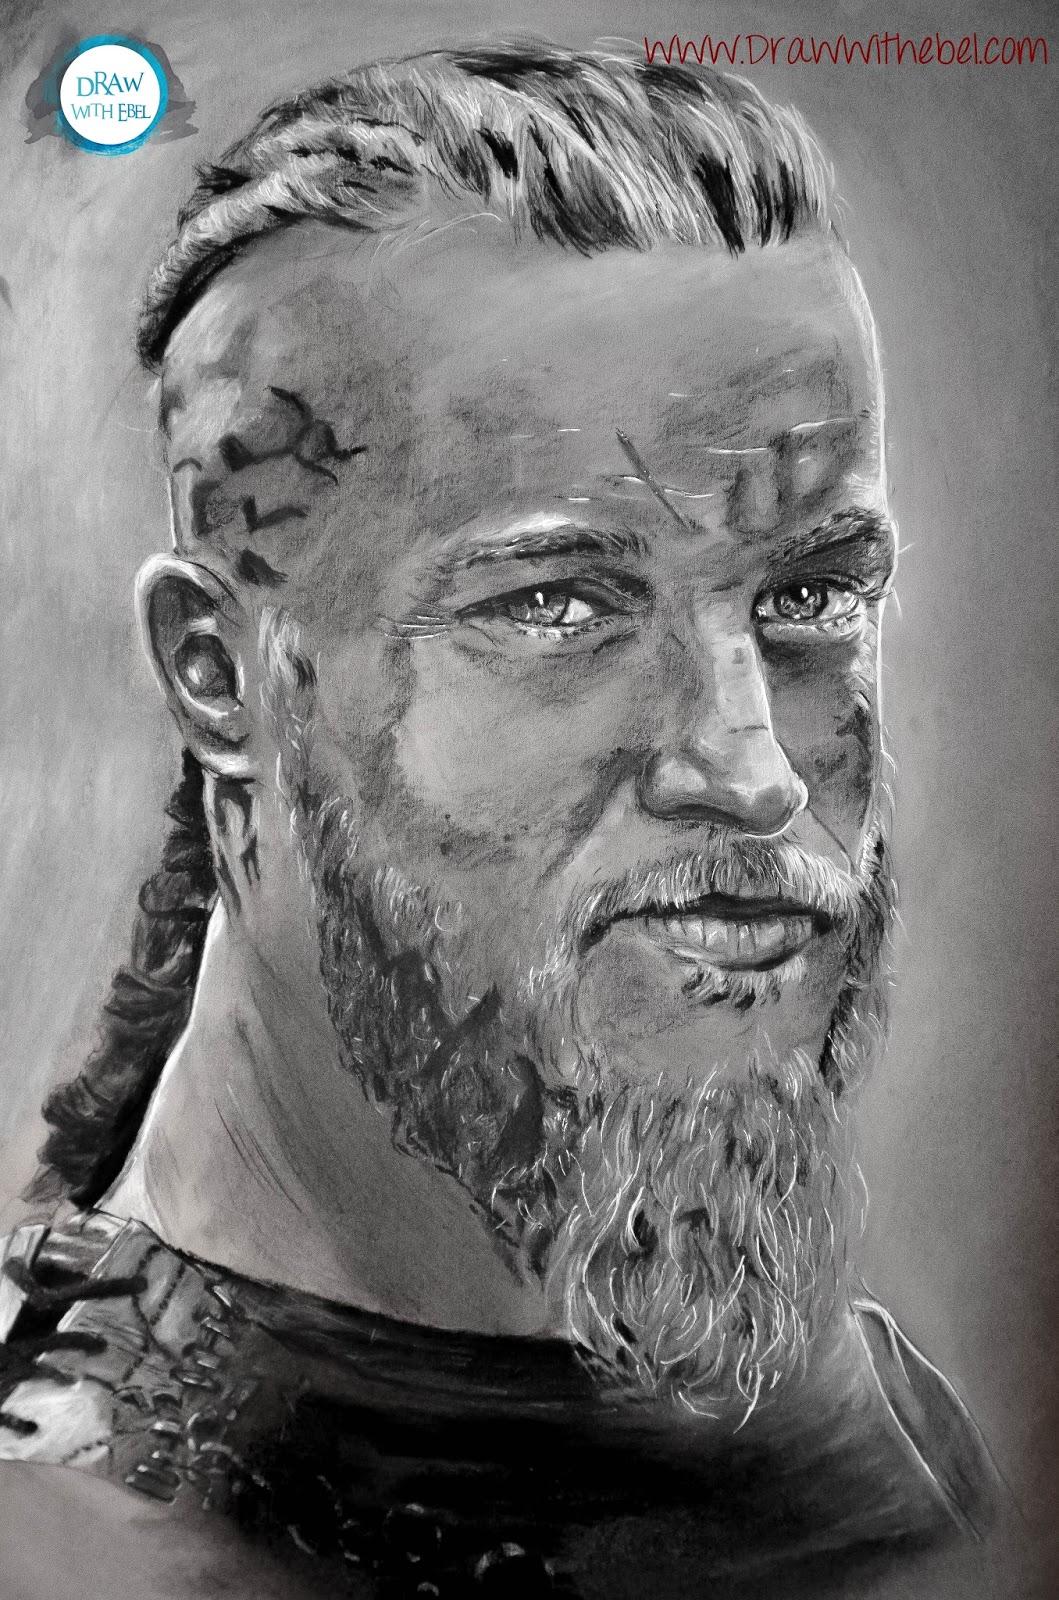 Draw With Ebel: Speed Drawing De Ragnar Lodbrok